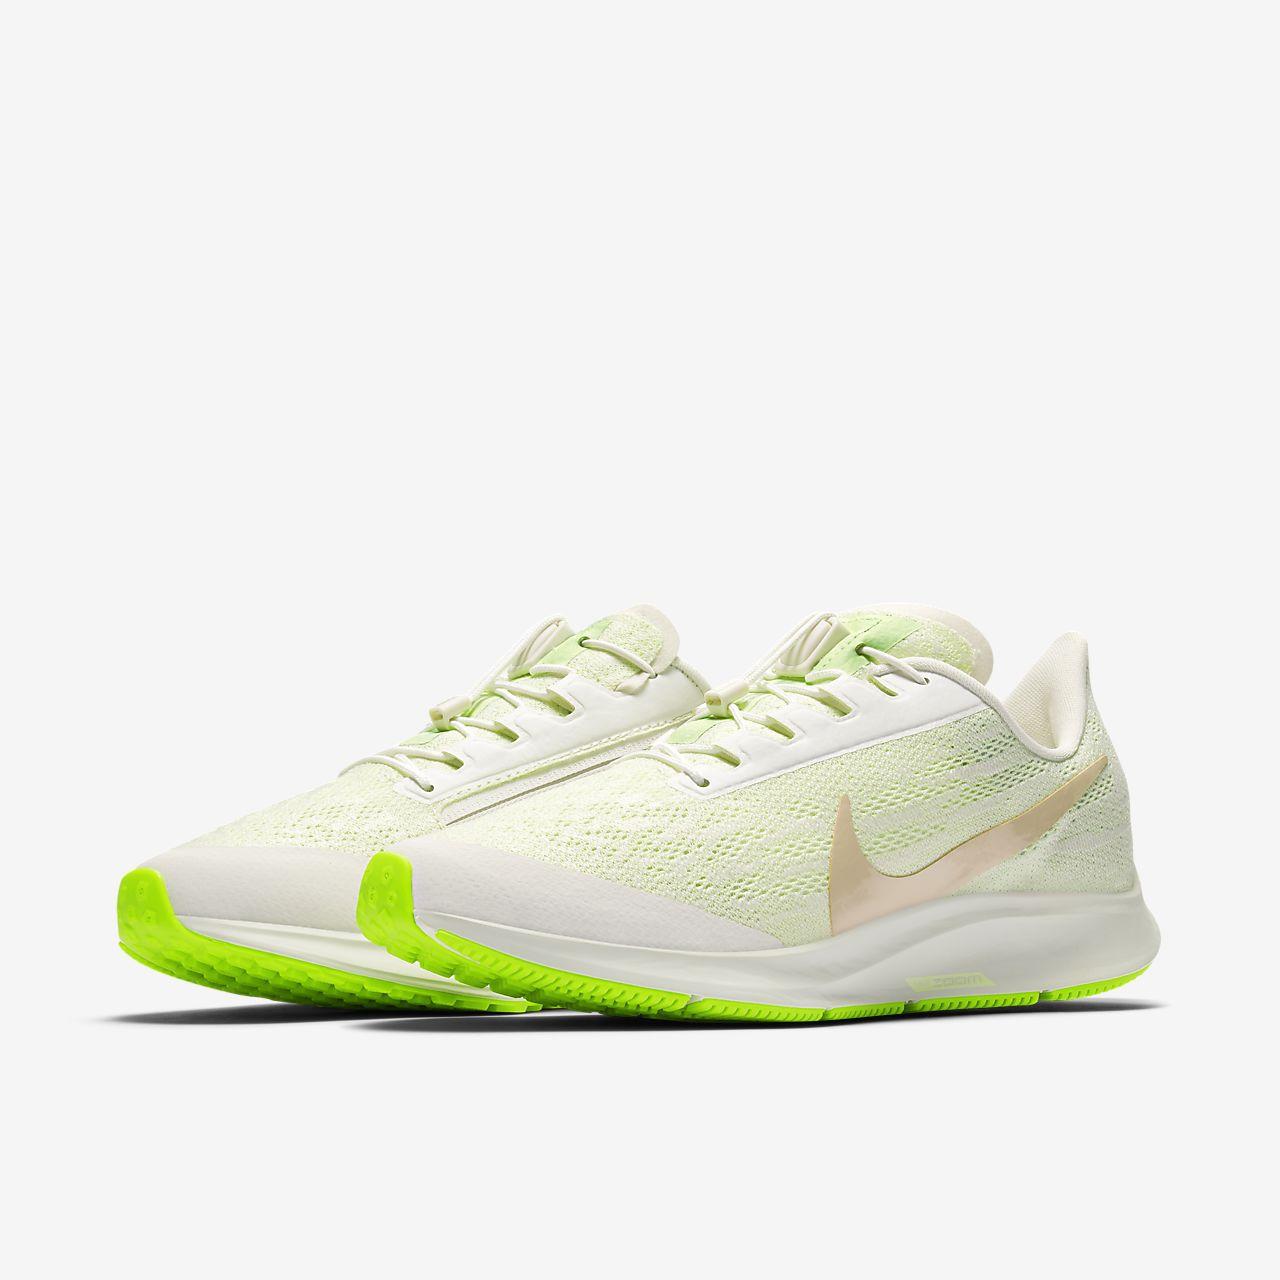 Chaussure de running Nike Air Zoom Pegasus 36 FlyEase pour Femme (large)